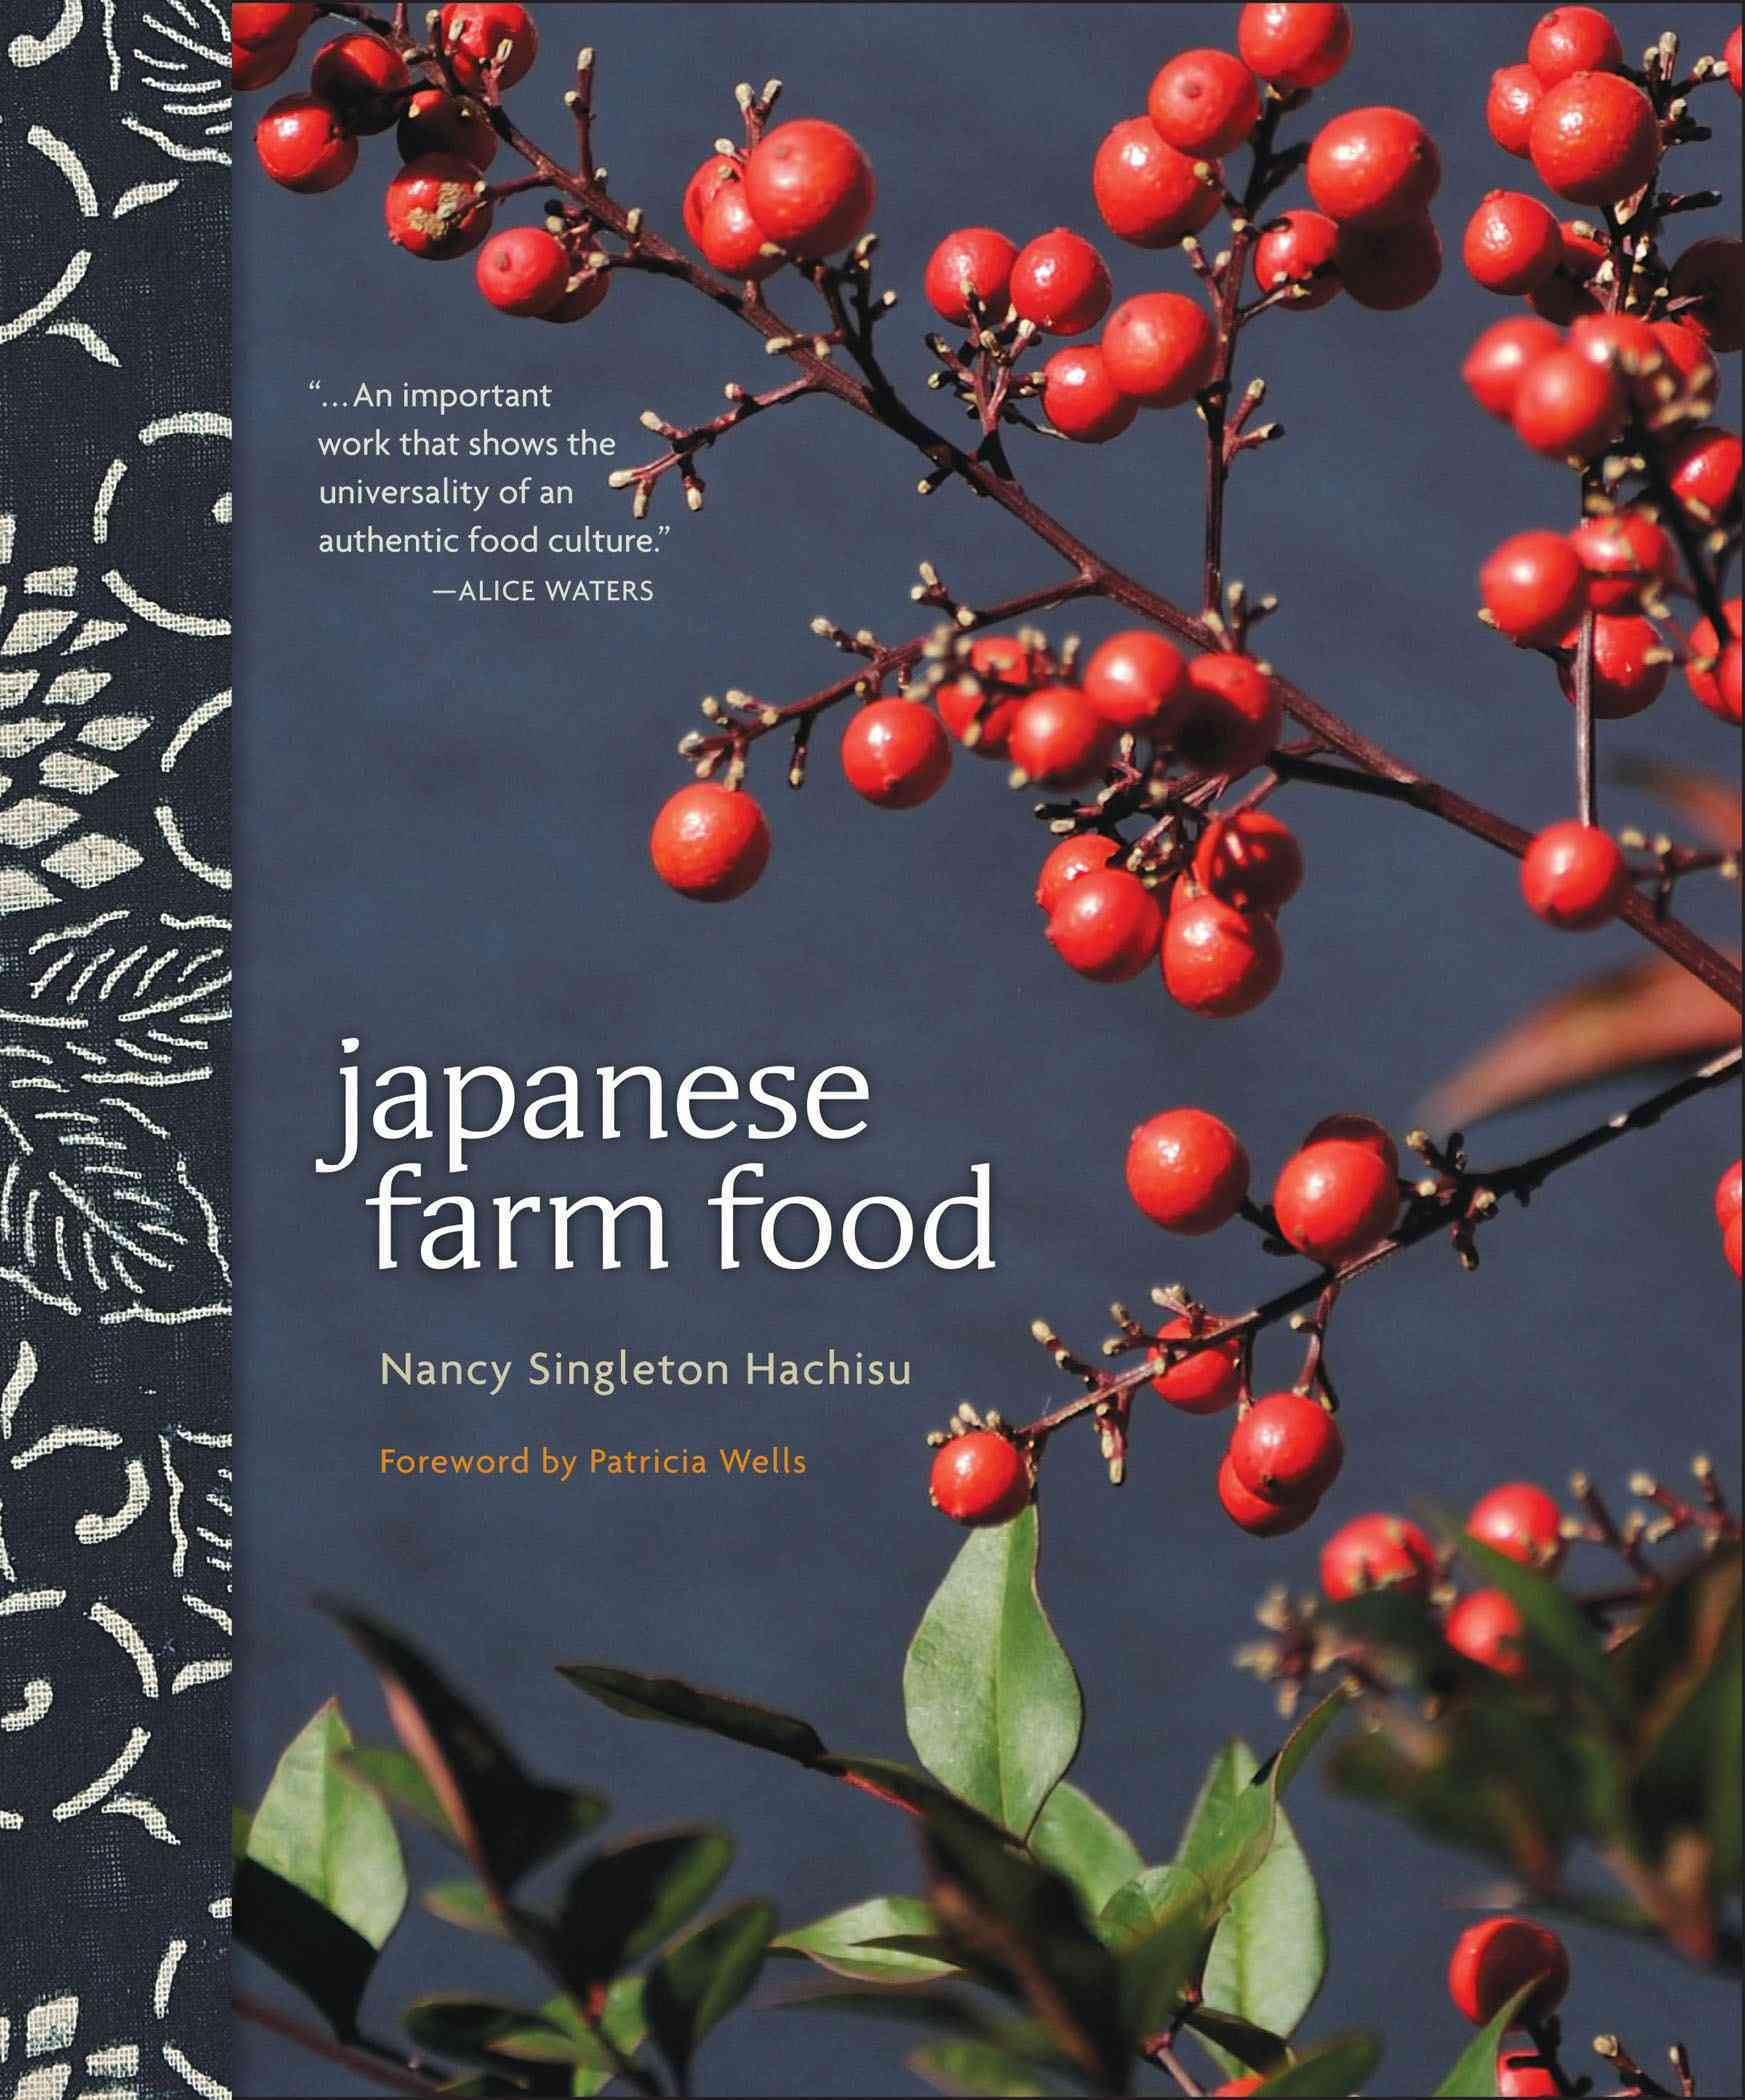 Japanese Farm Food (Hardcover)